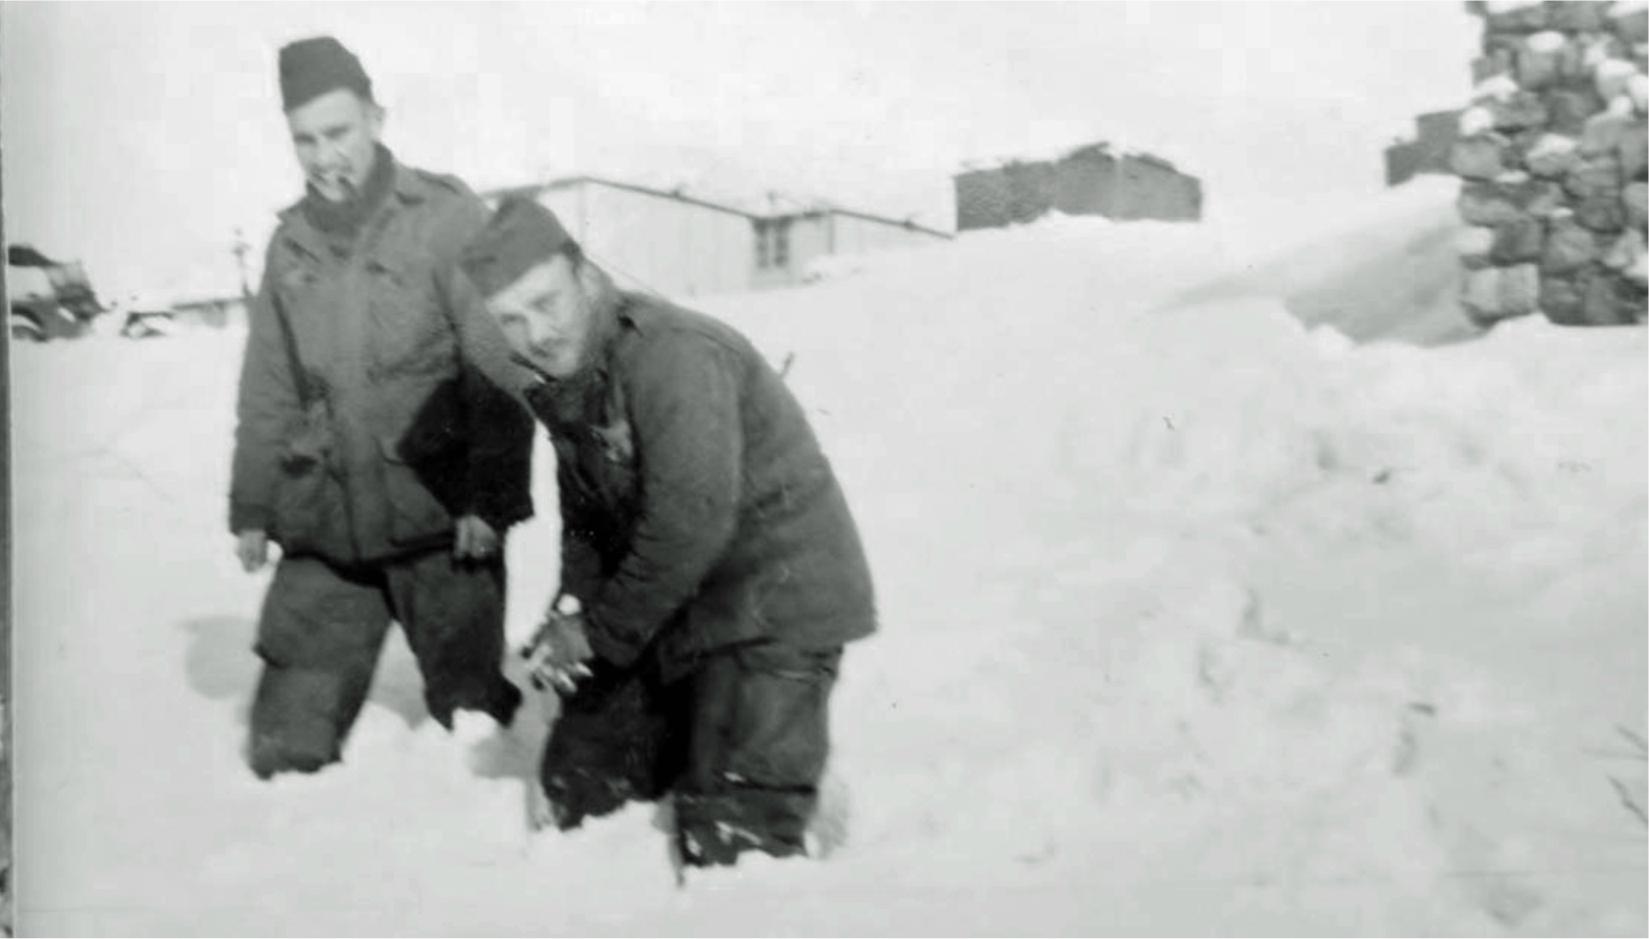 снег 12 янв 1960 в Бишара.jpg